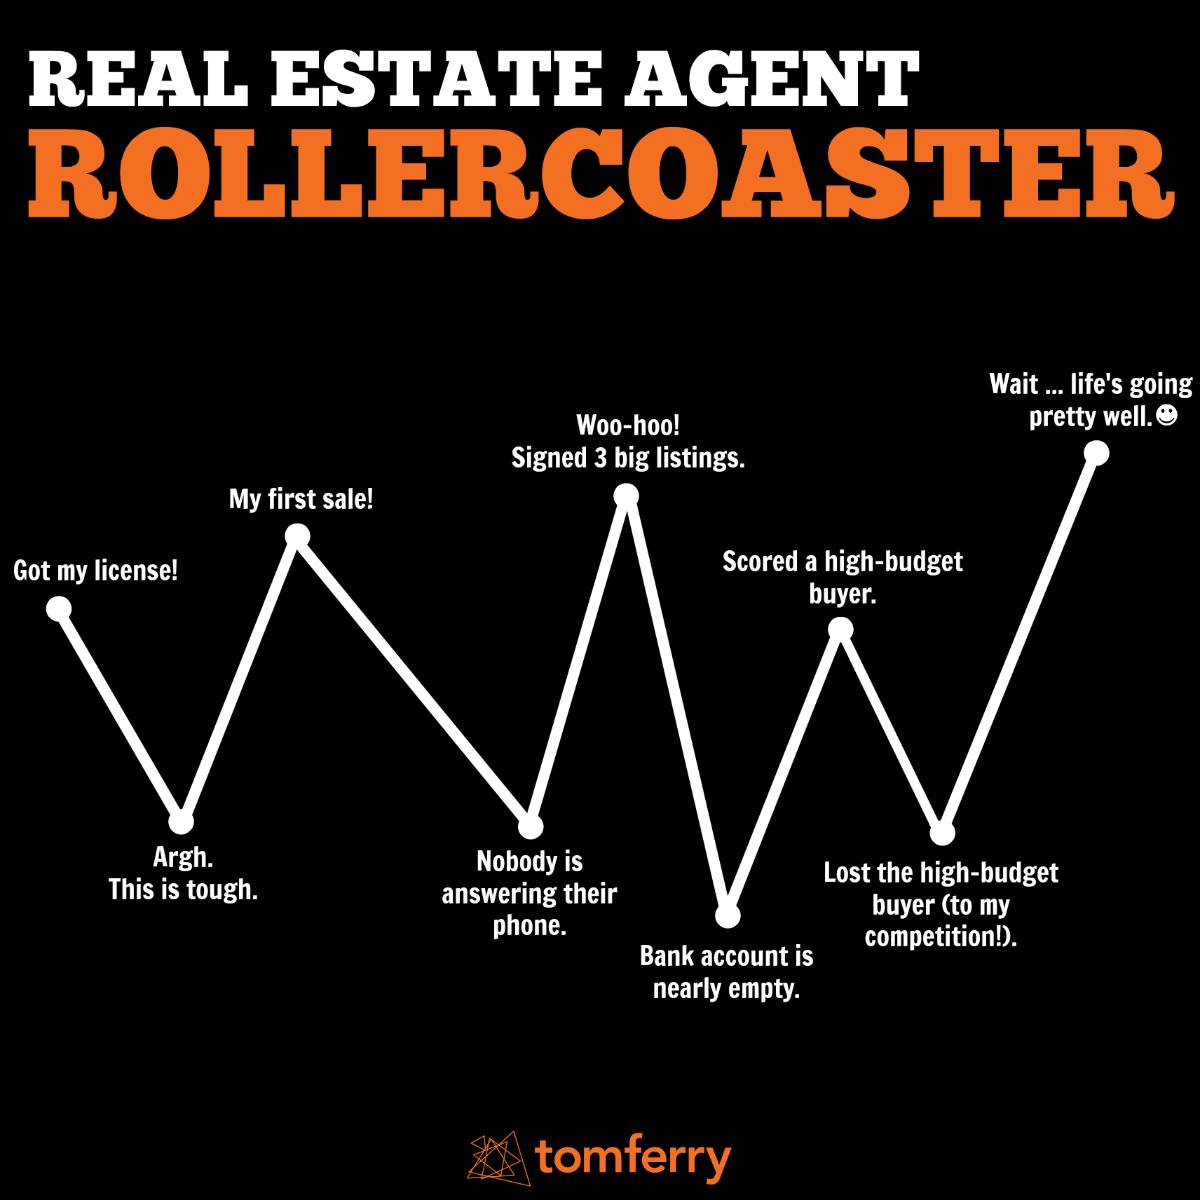 RealEstateAgentRollercoaster